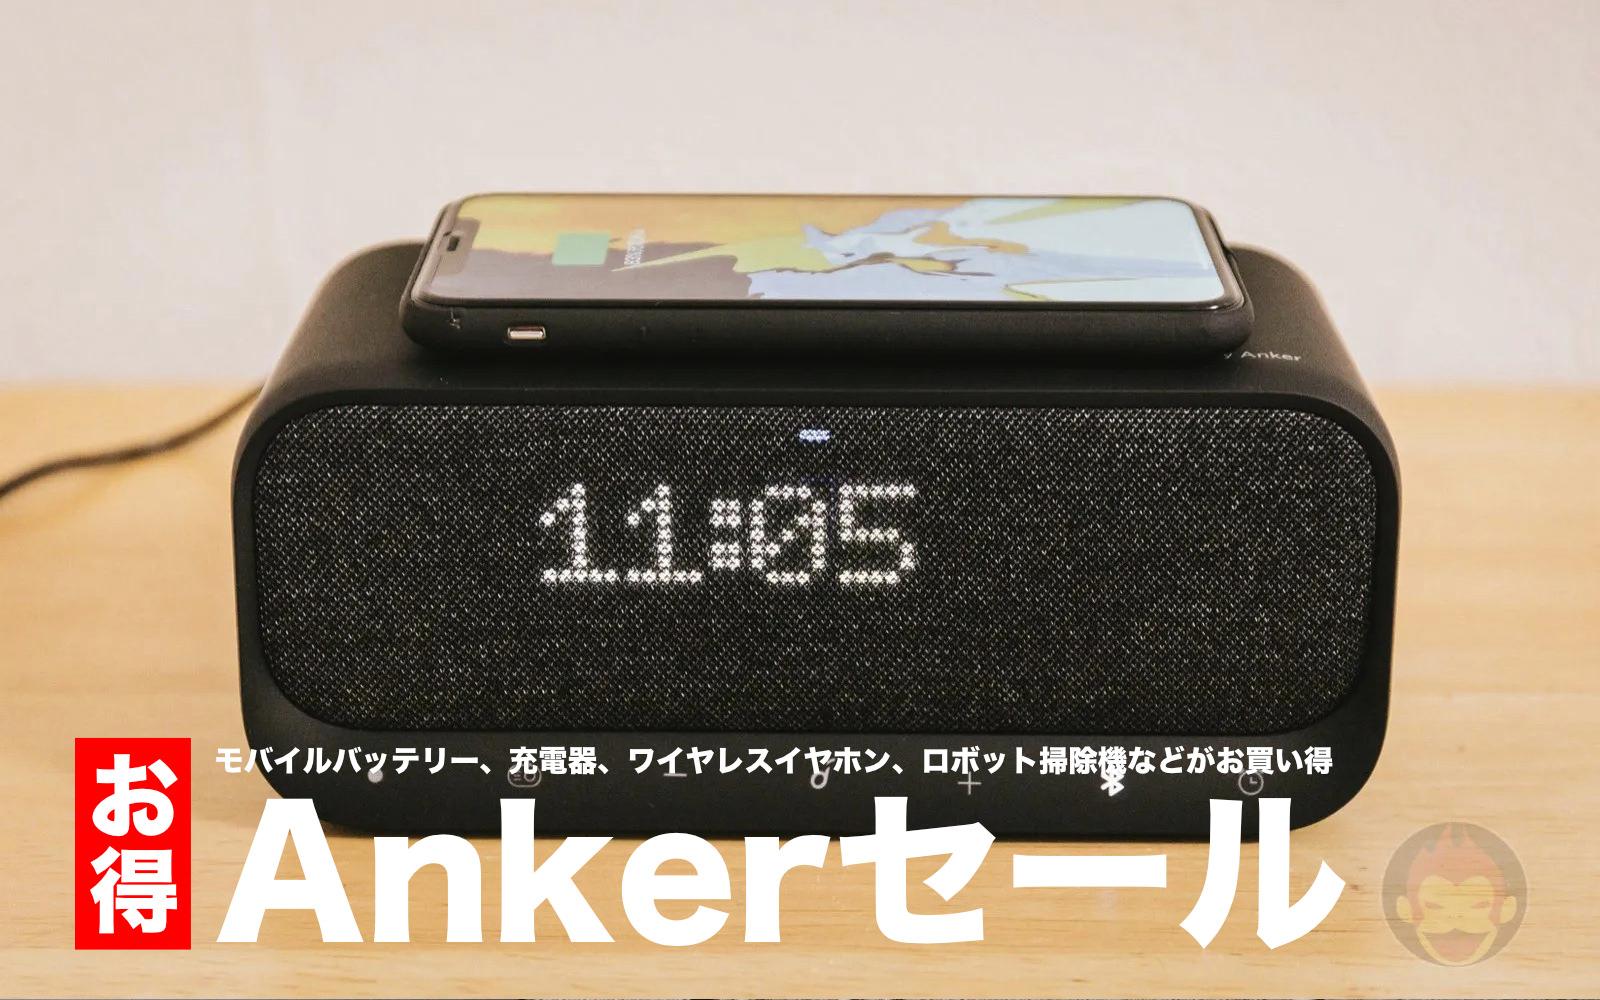 Anker Sale 20200919